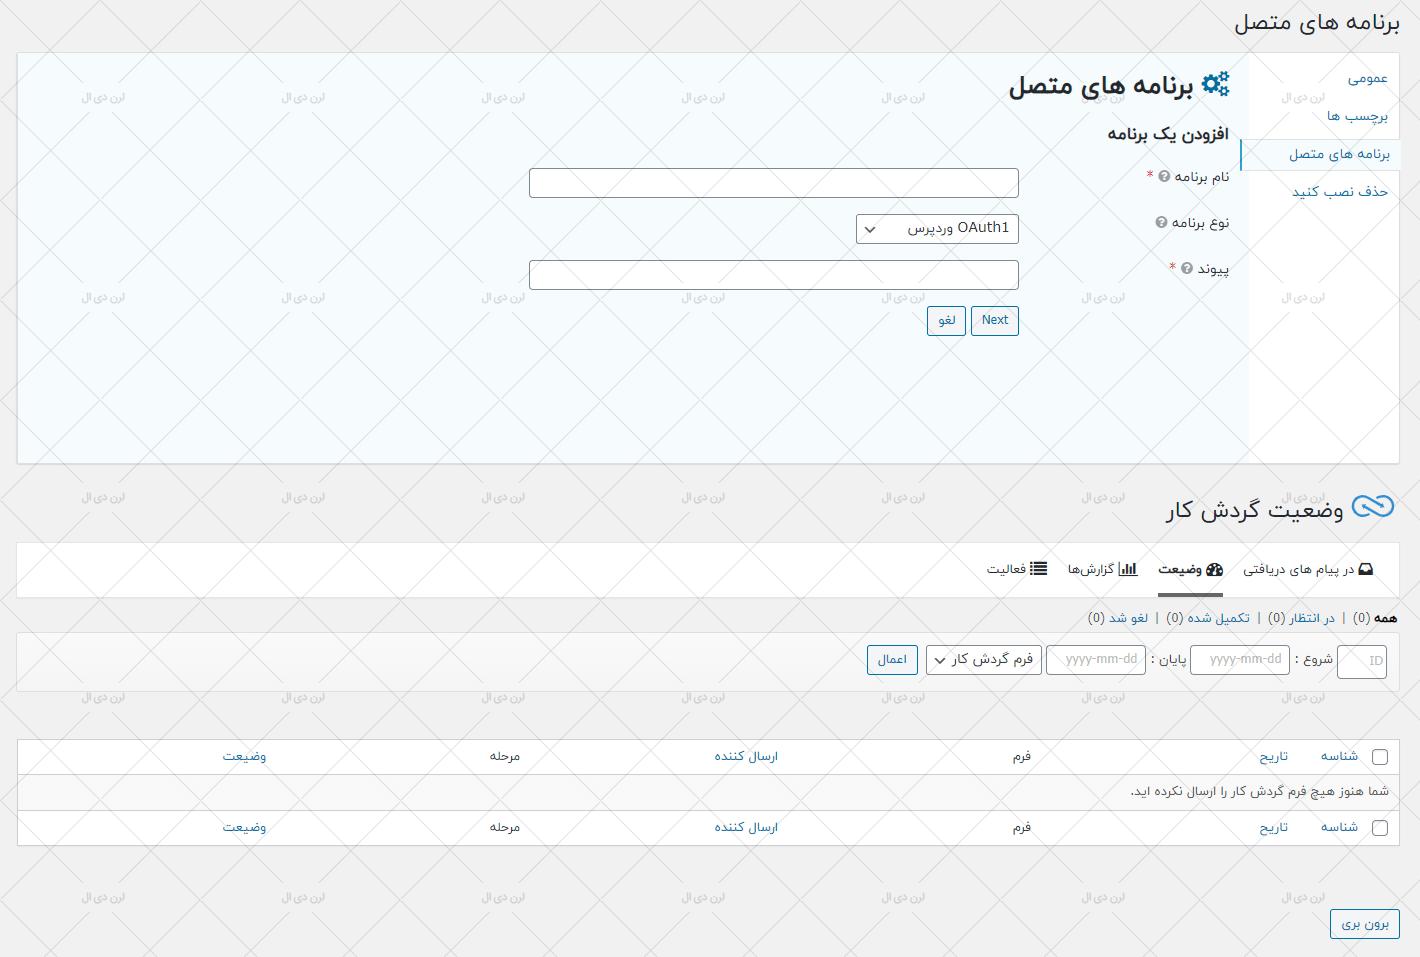 Gravity Flow نسخه فارسی شده